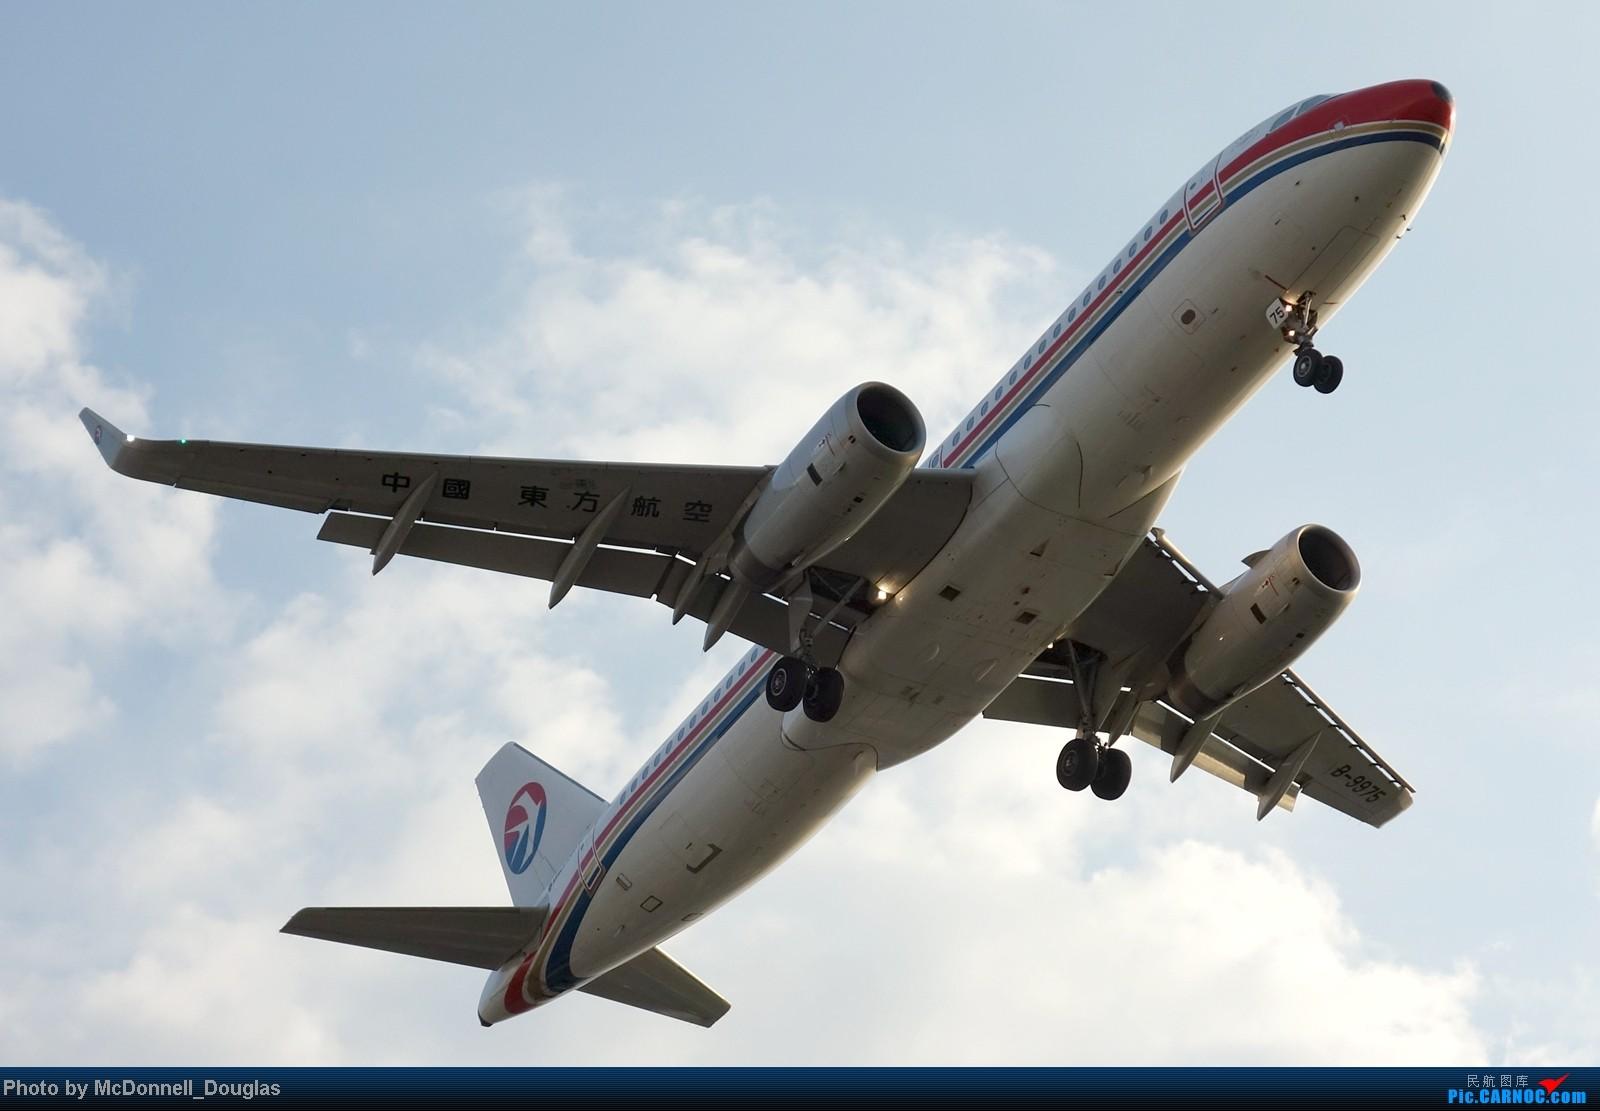 Re:[原创]【上海飞友会】ZSSS杂图一组 AIRBUS A320-200 B-9975 中国上海虹桥机场